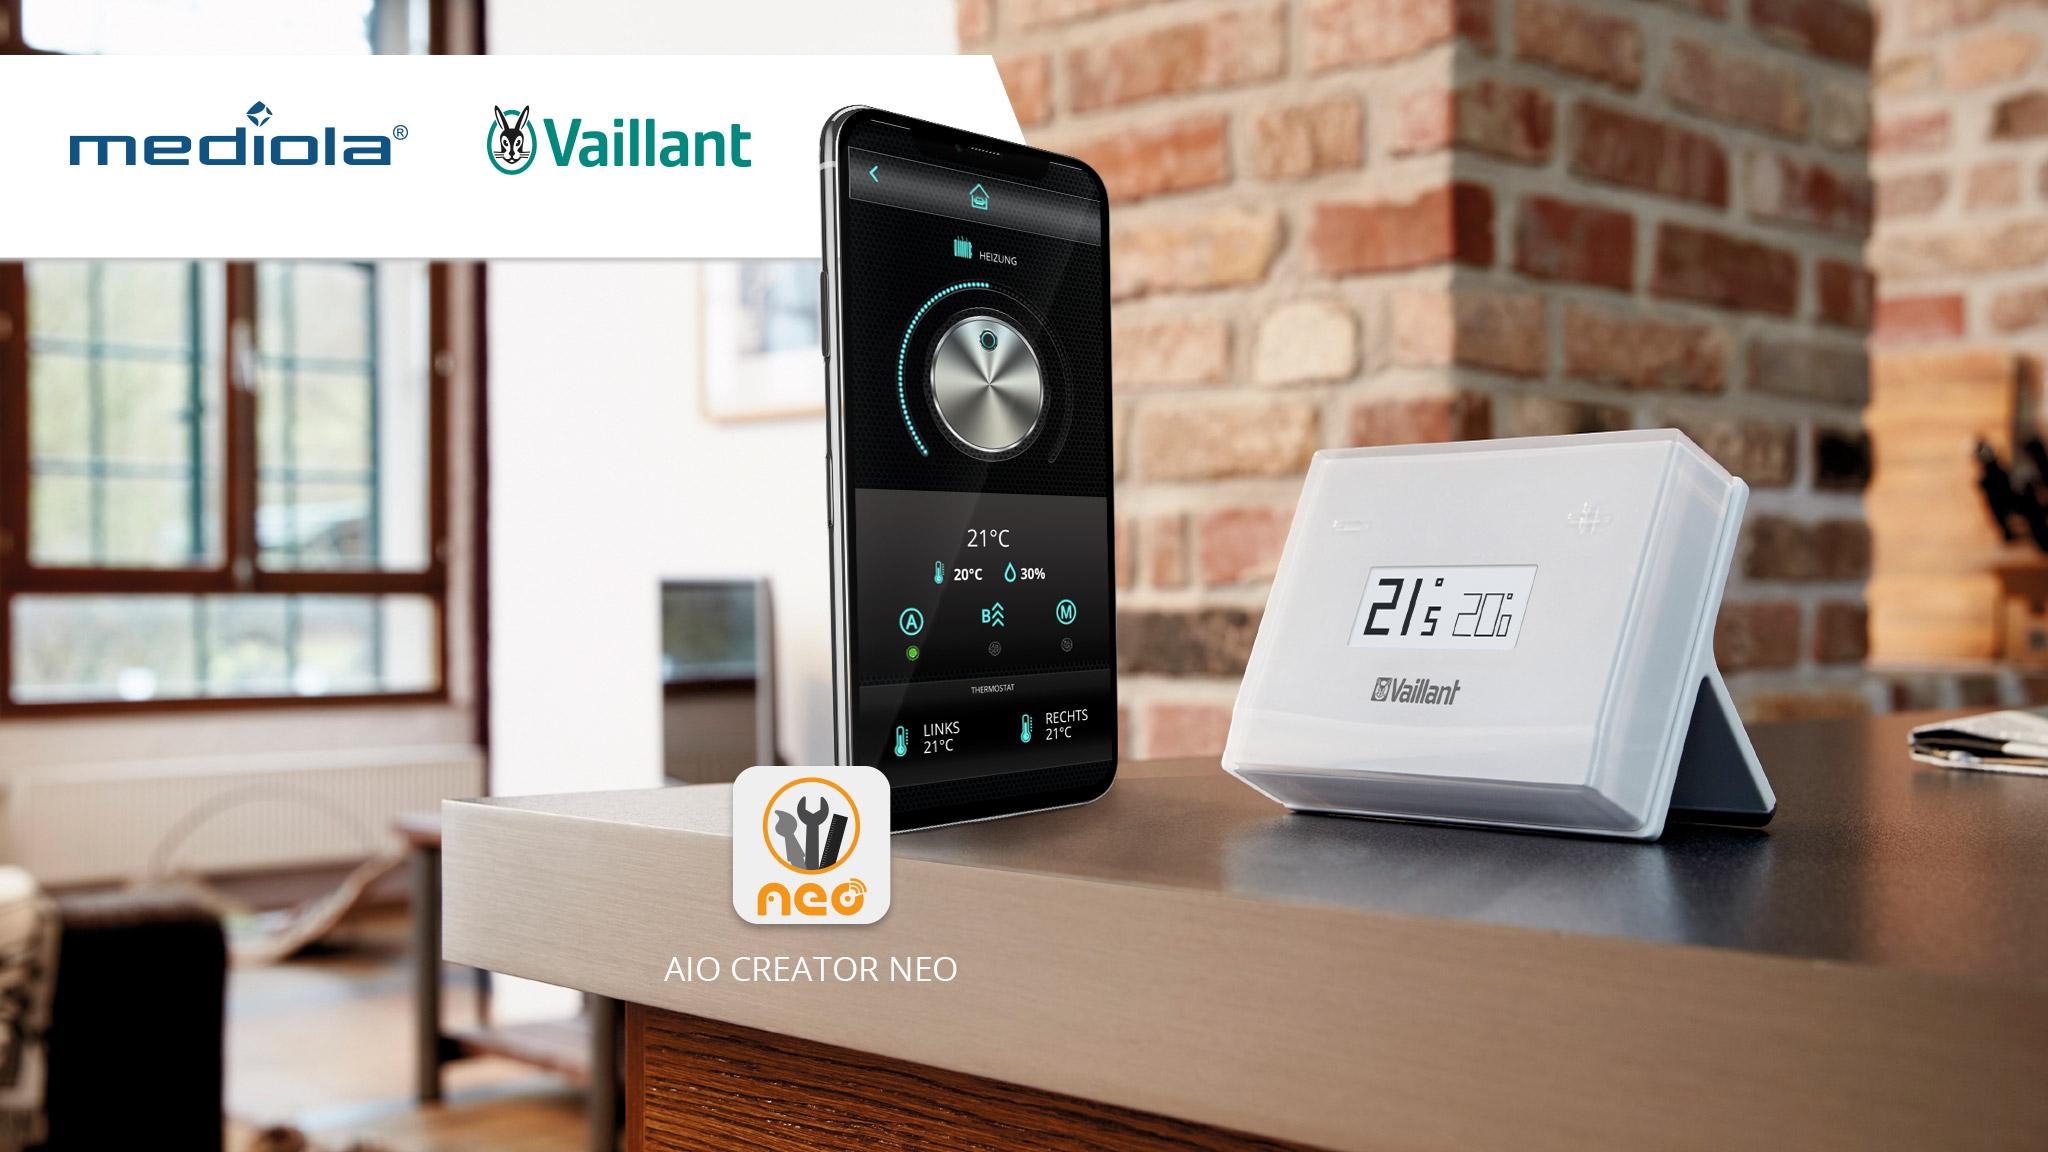 mediola® integriert Vaillant Heizungssteuerung - Smart Home Thermostat